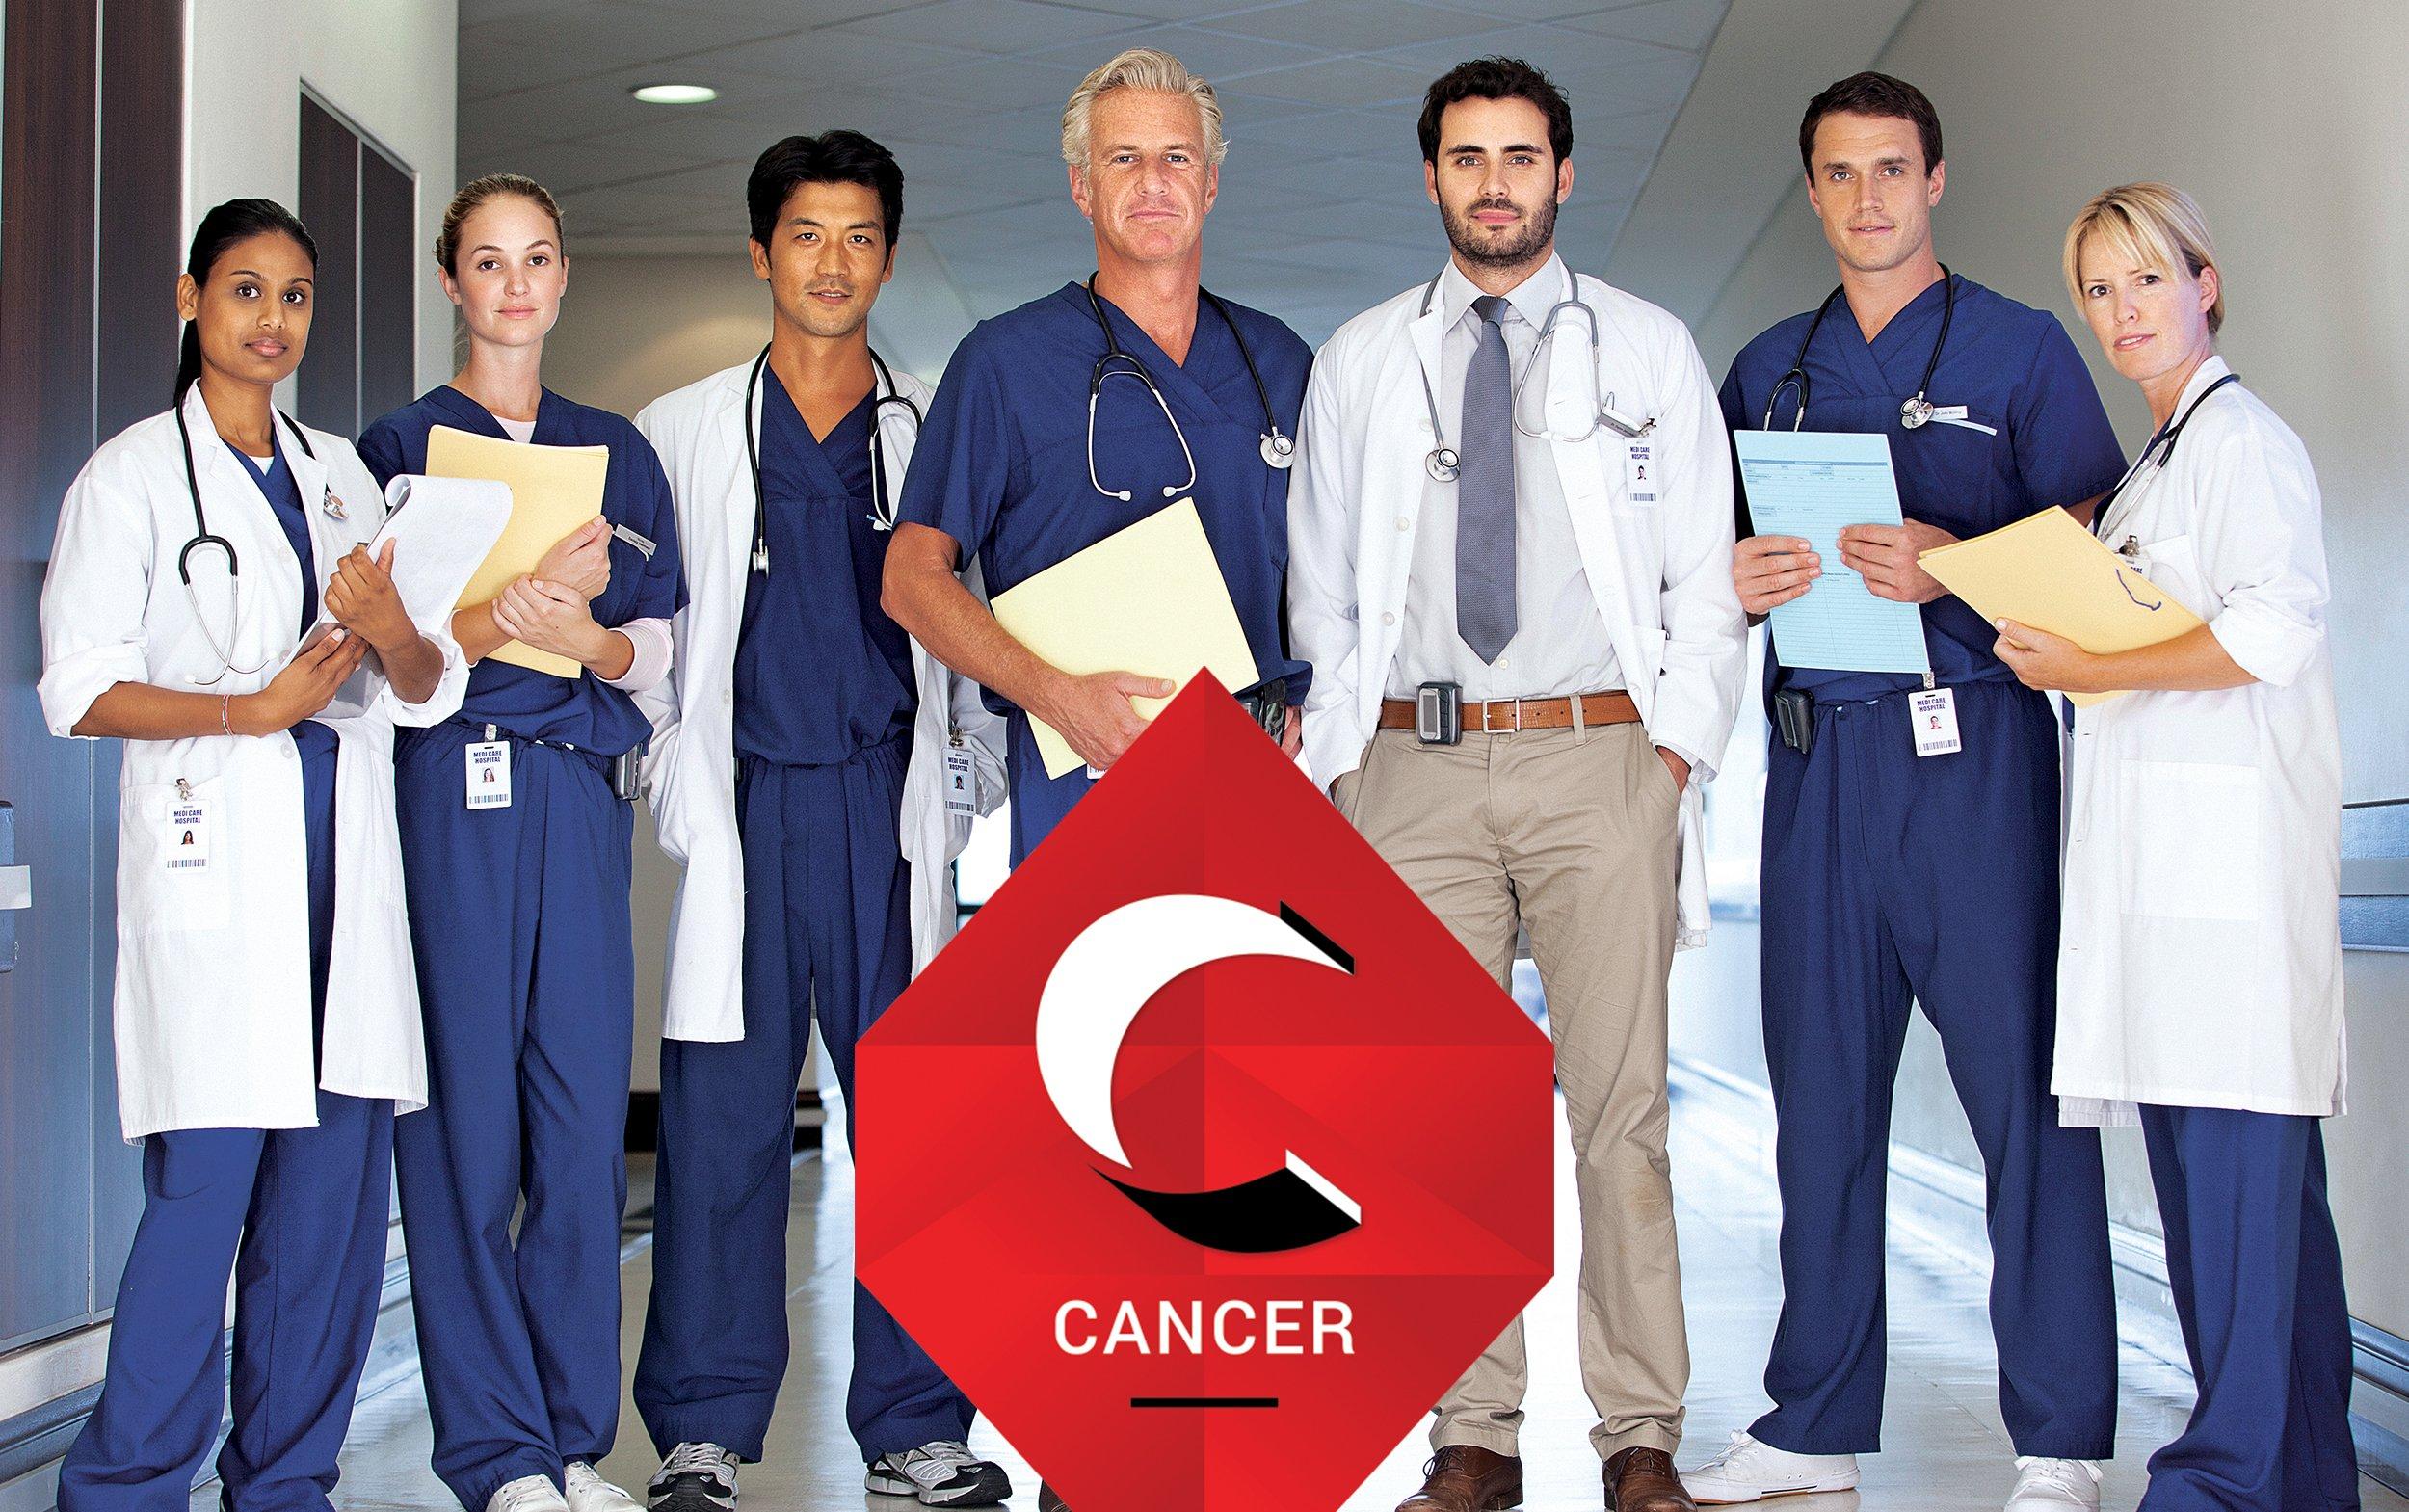 cancer_image-01